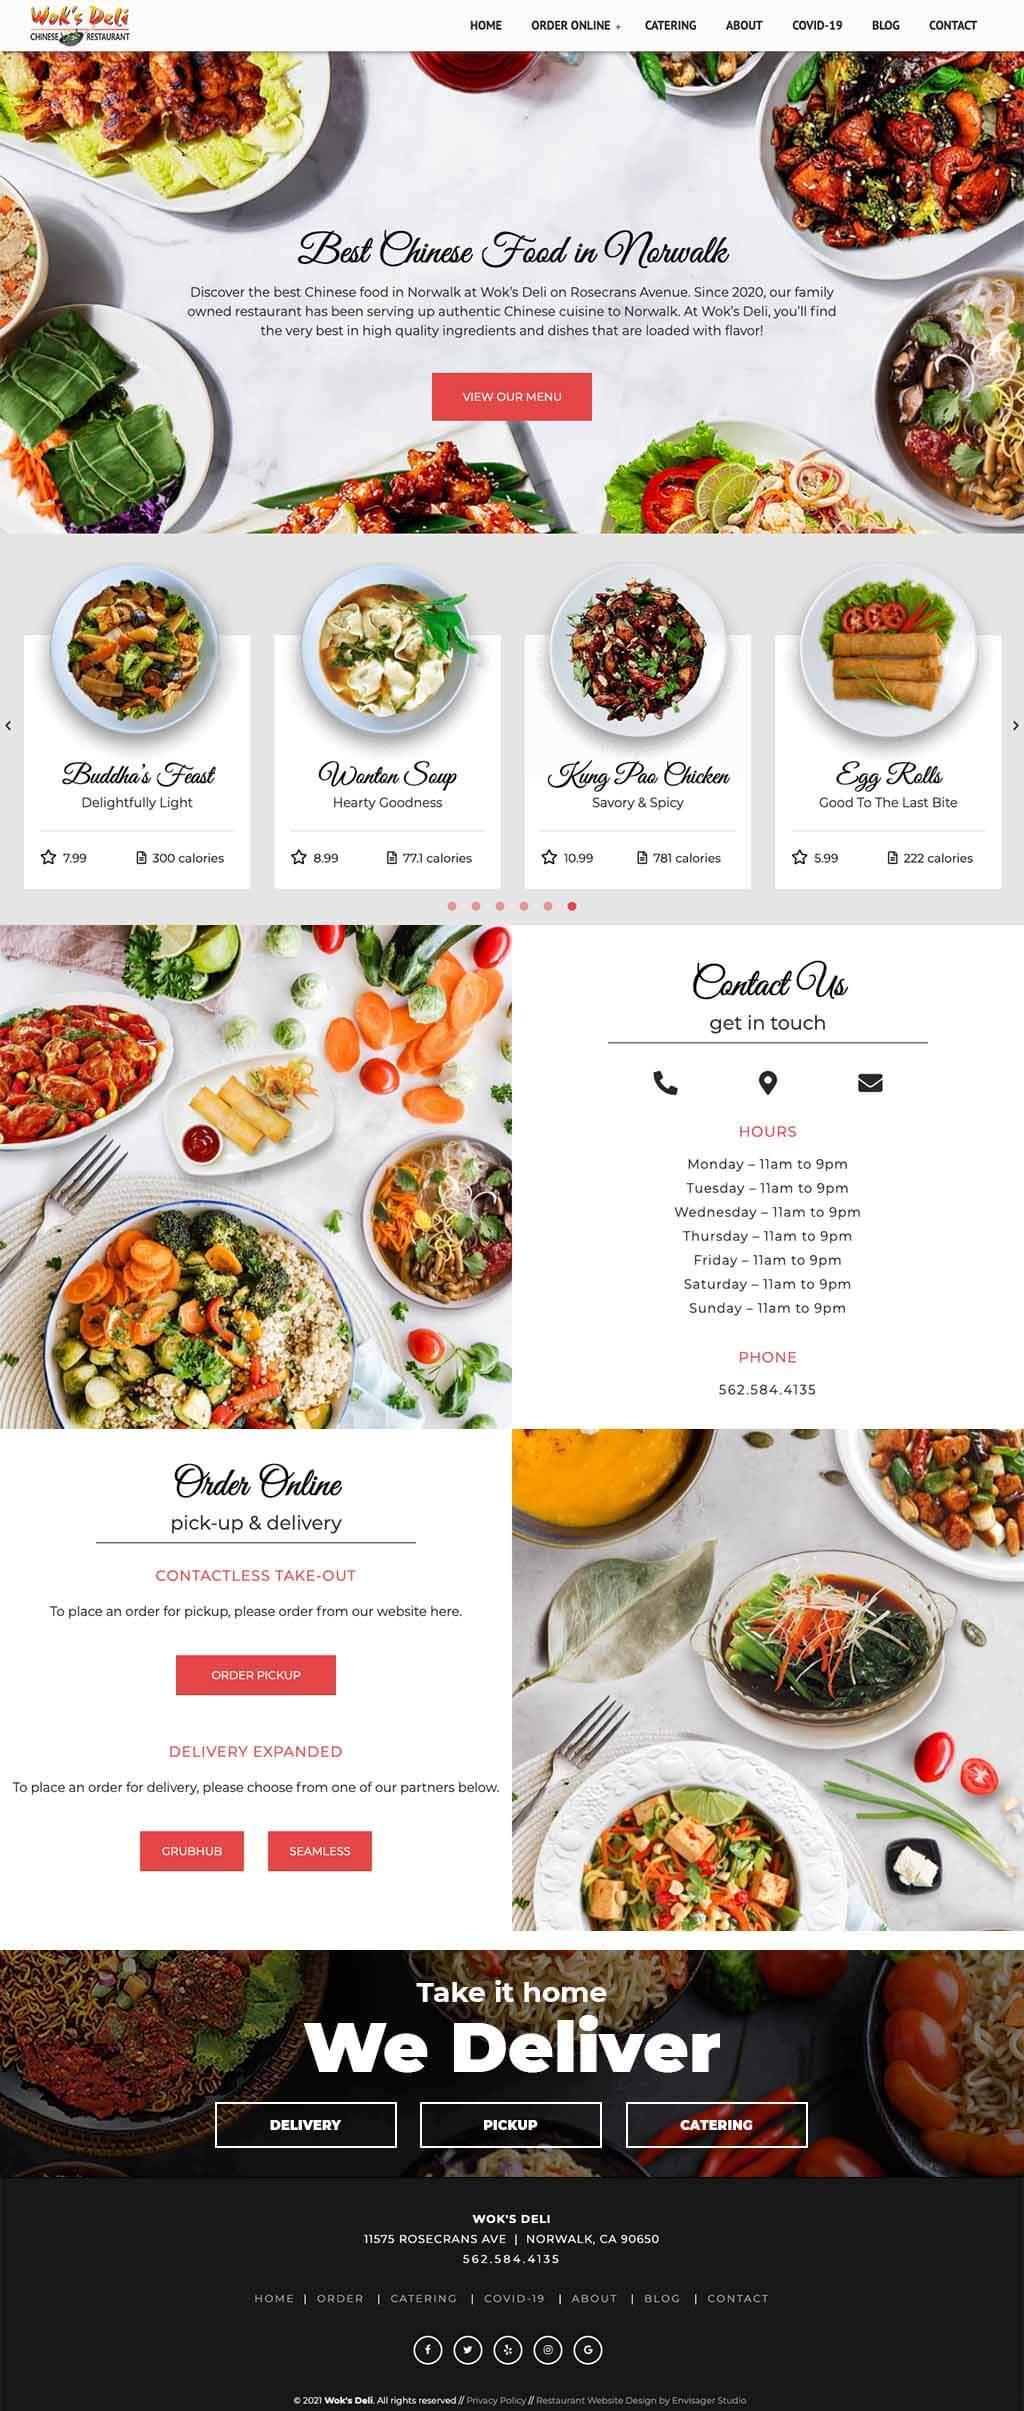 Wok's Deli Chinese Restaurant Website Design